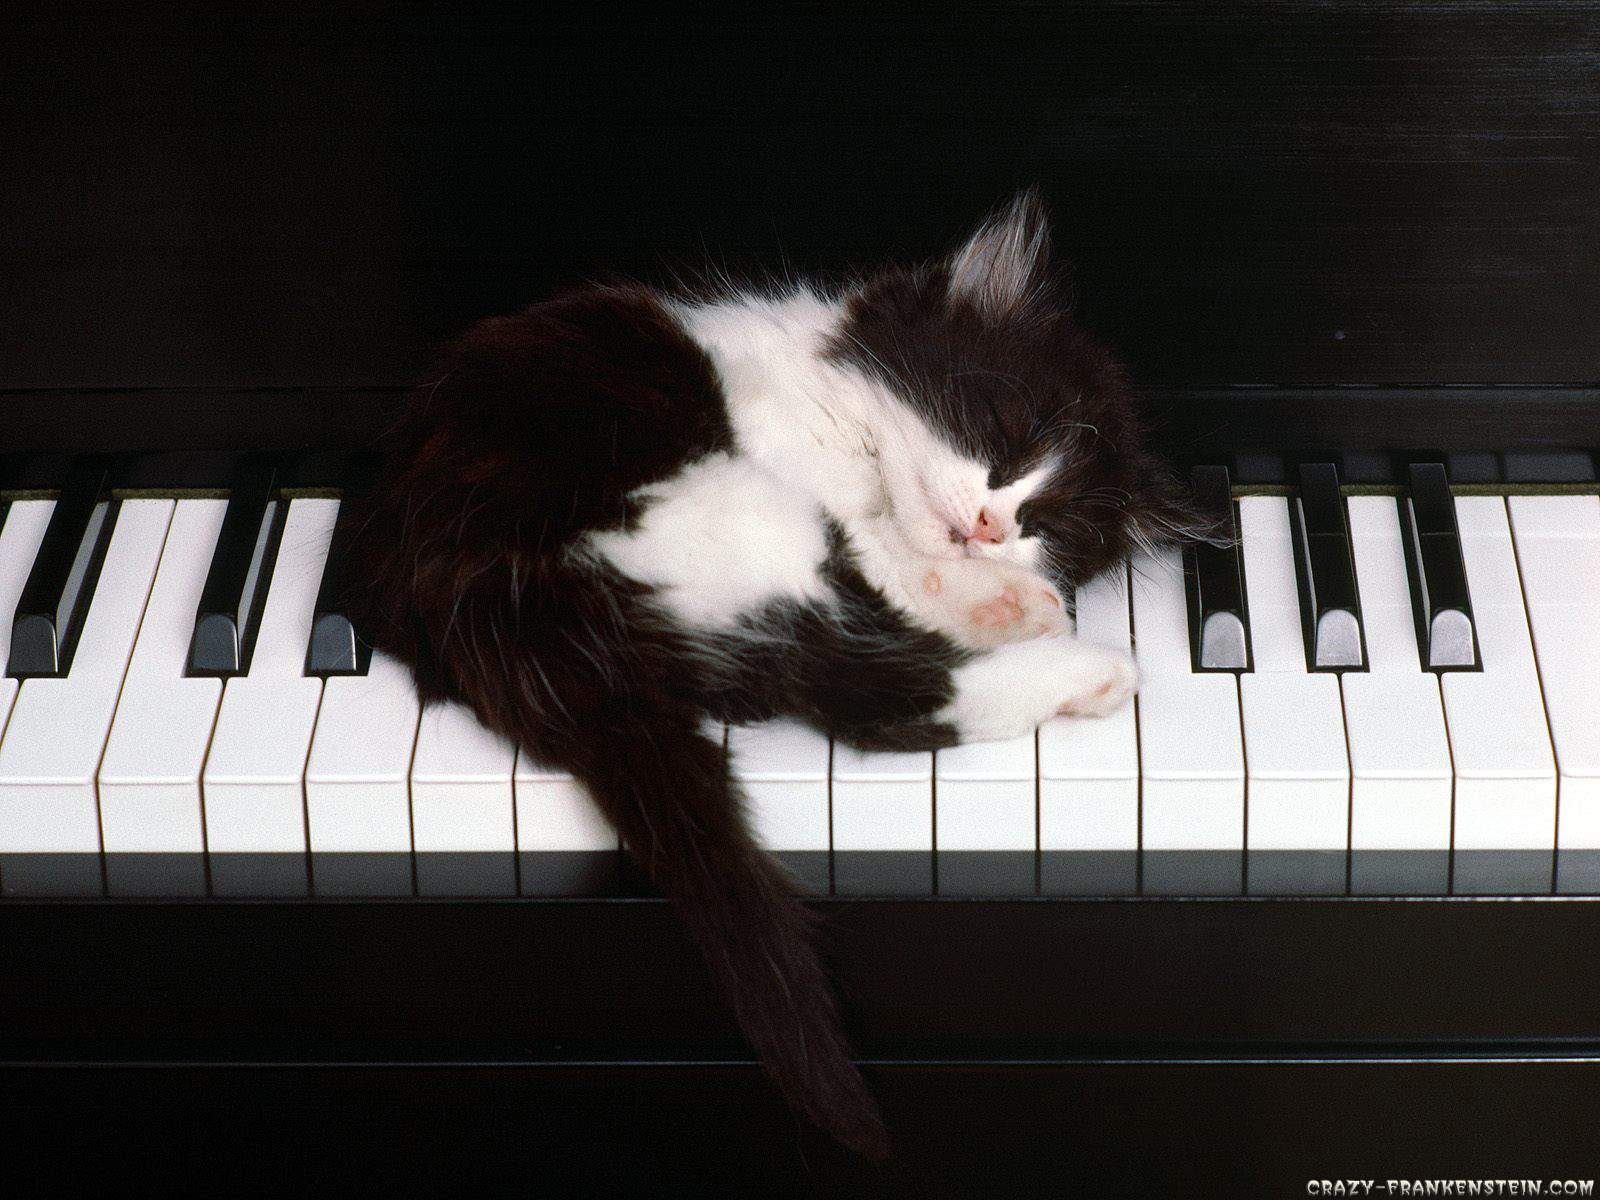 http://2.bp.blogspot.com/-aQPymjwGNHs/UGgdNA-JsWI/AAAAAAAAAfo/gQ5LBlNg-OU/s1600/black-white-cat-and-piano-wallpaper-.jpg